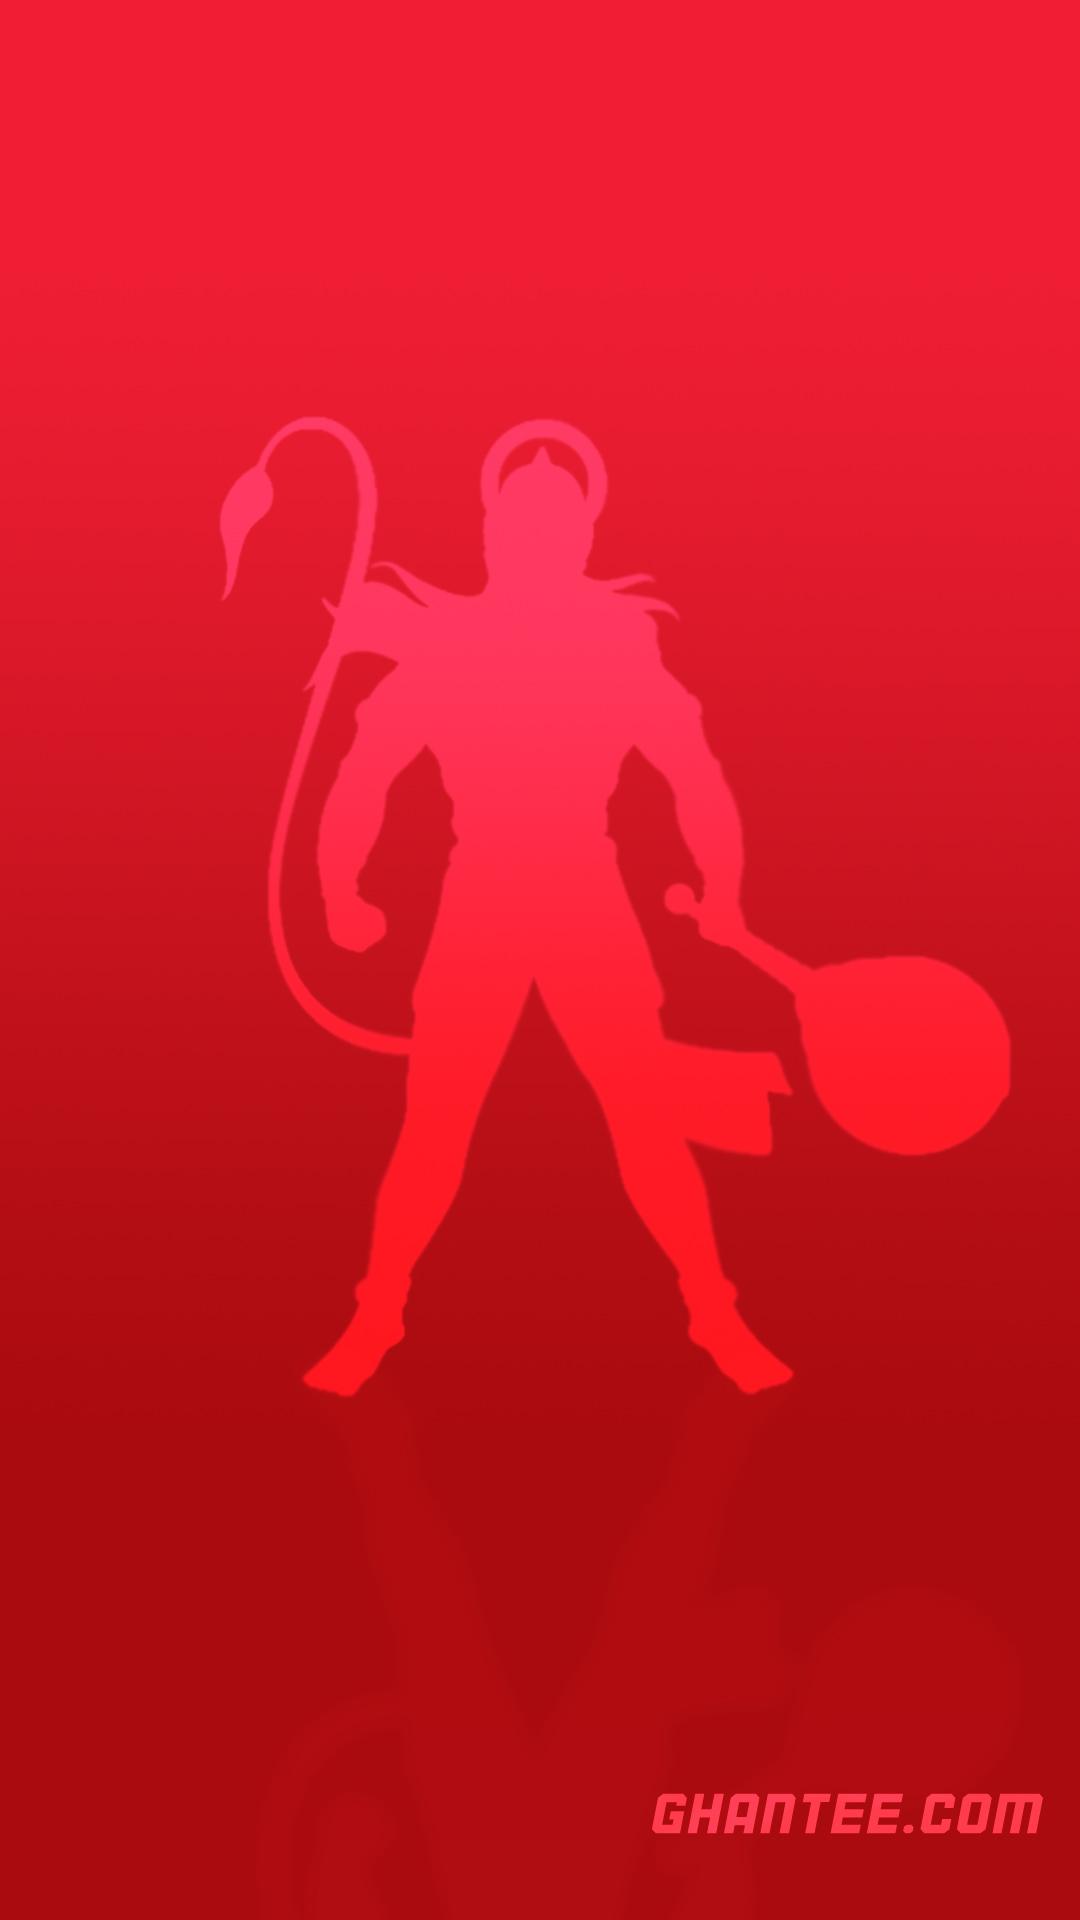 bajrangbali minimal red hd phone wallpaper | simplistic